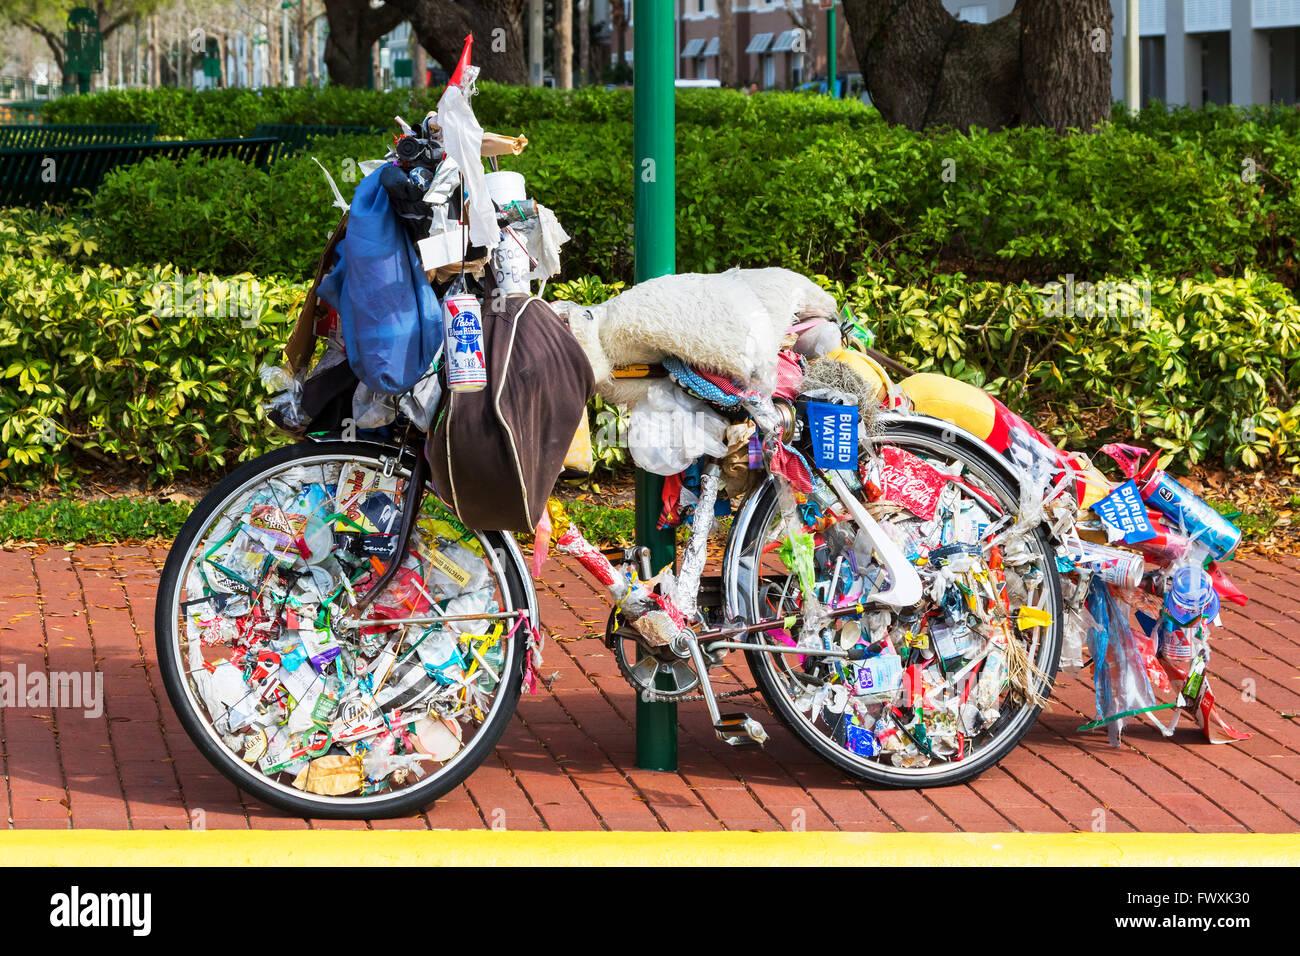 Altes Fahrrad Dekoriert Mit Mull Feier Osceola Bezirk Florida